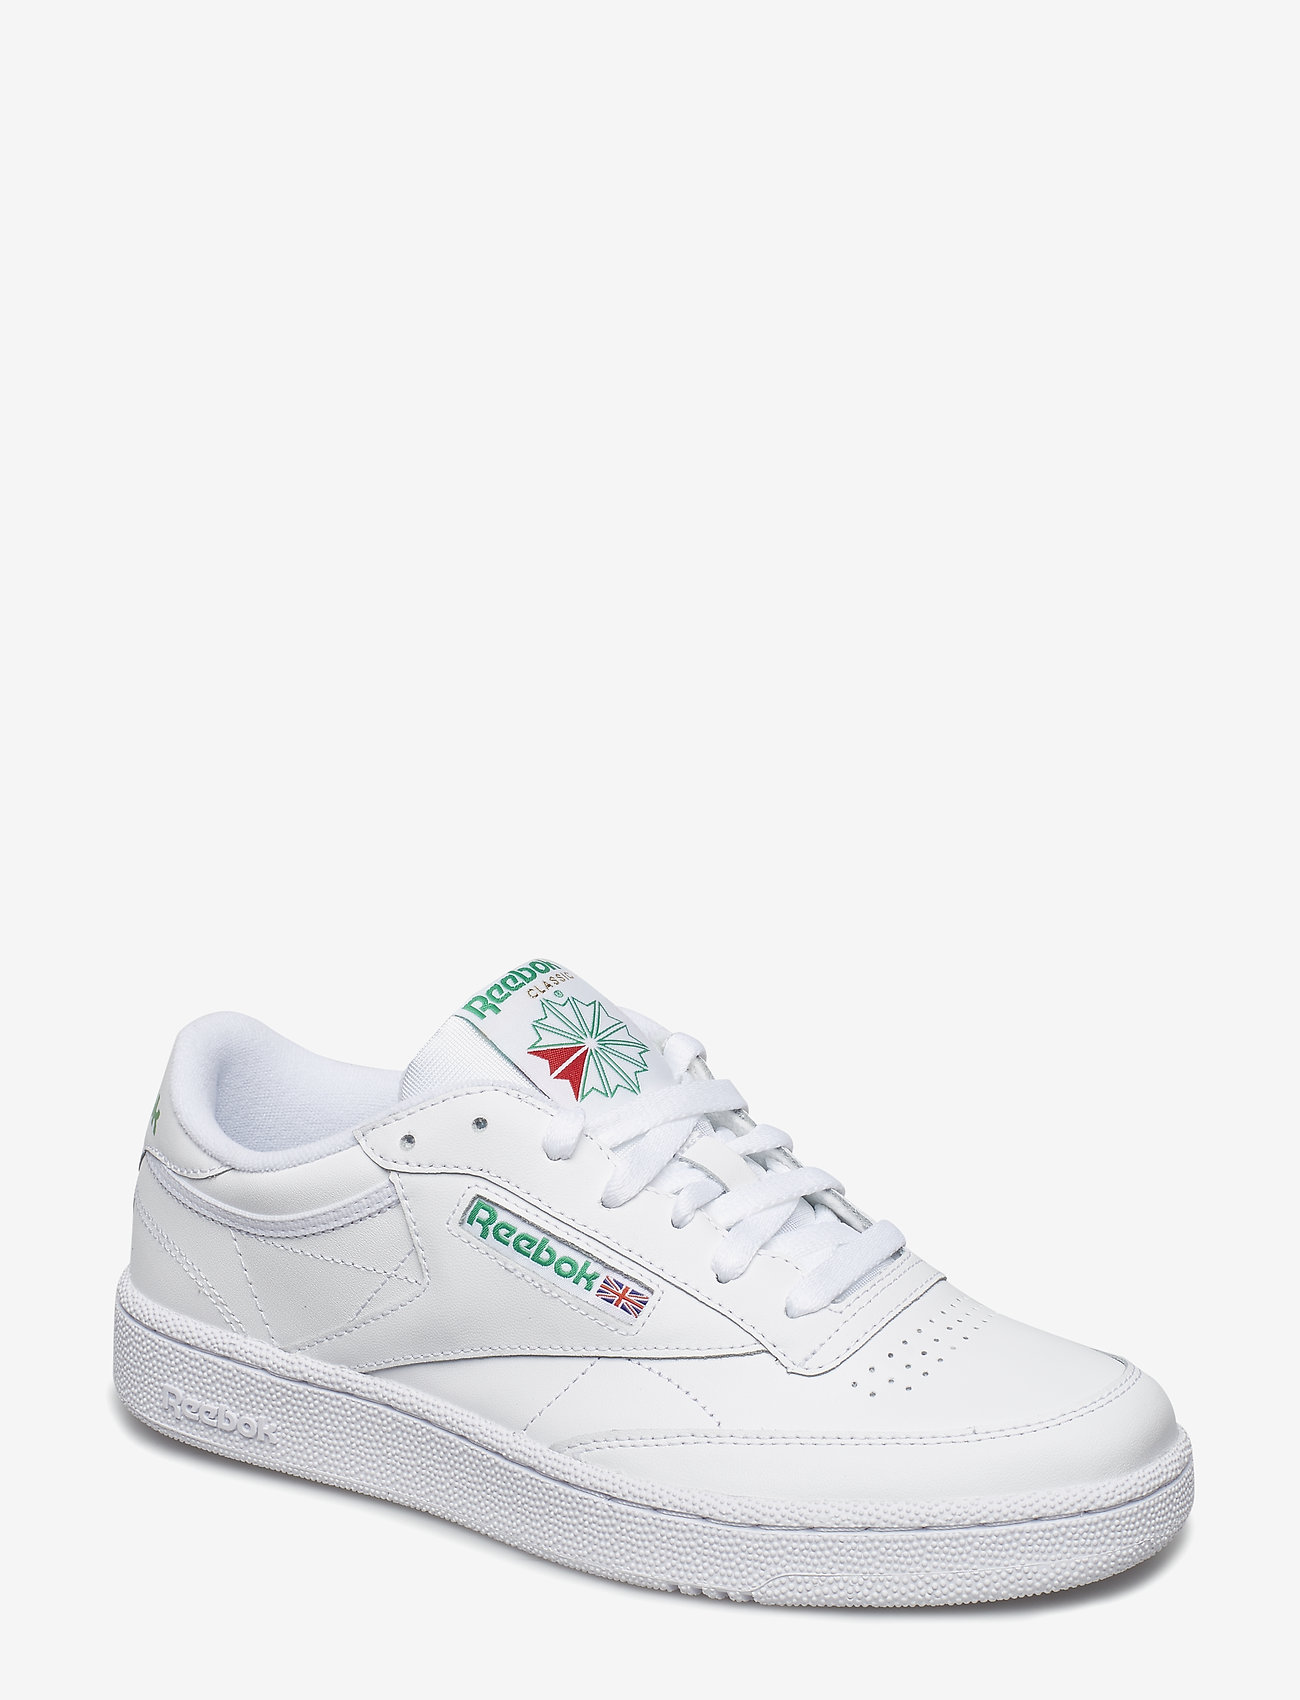 Reebok Classics - CLUB C 85 - laag sneakers - white/green - 0